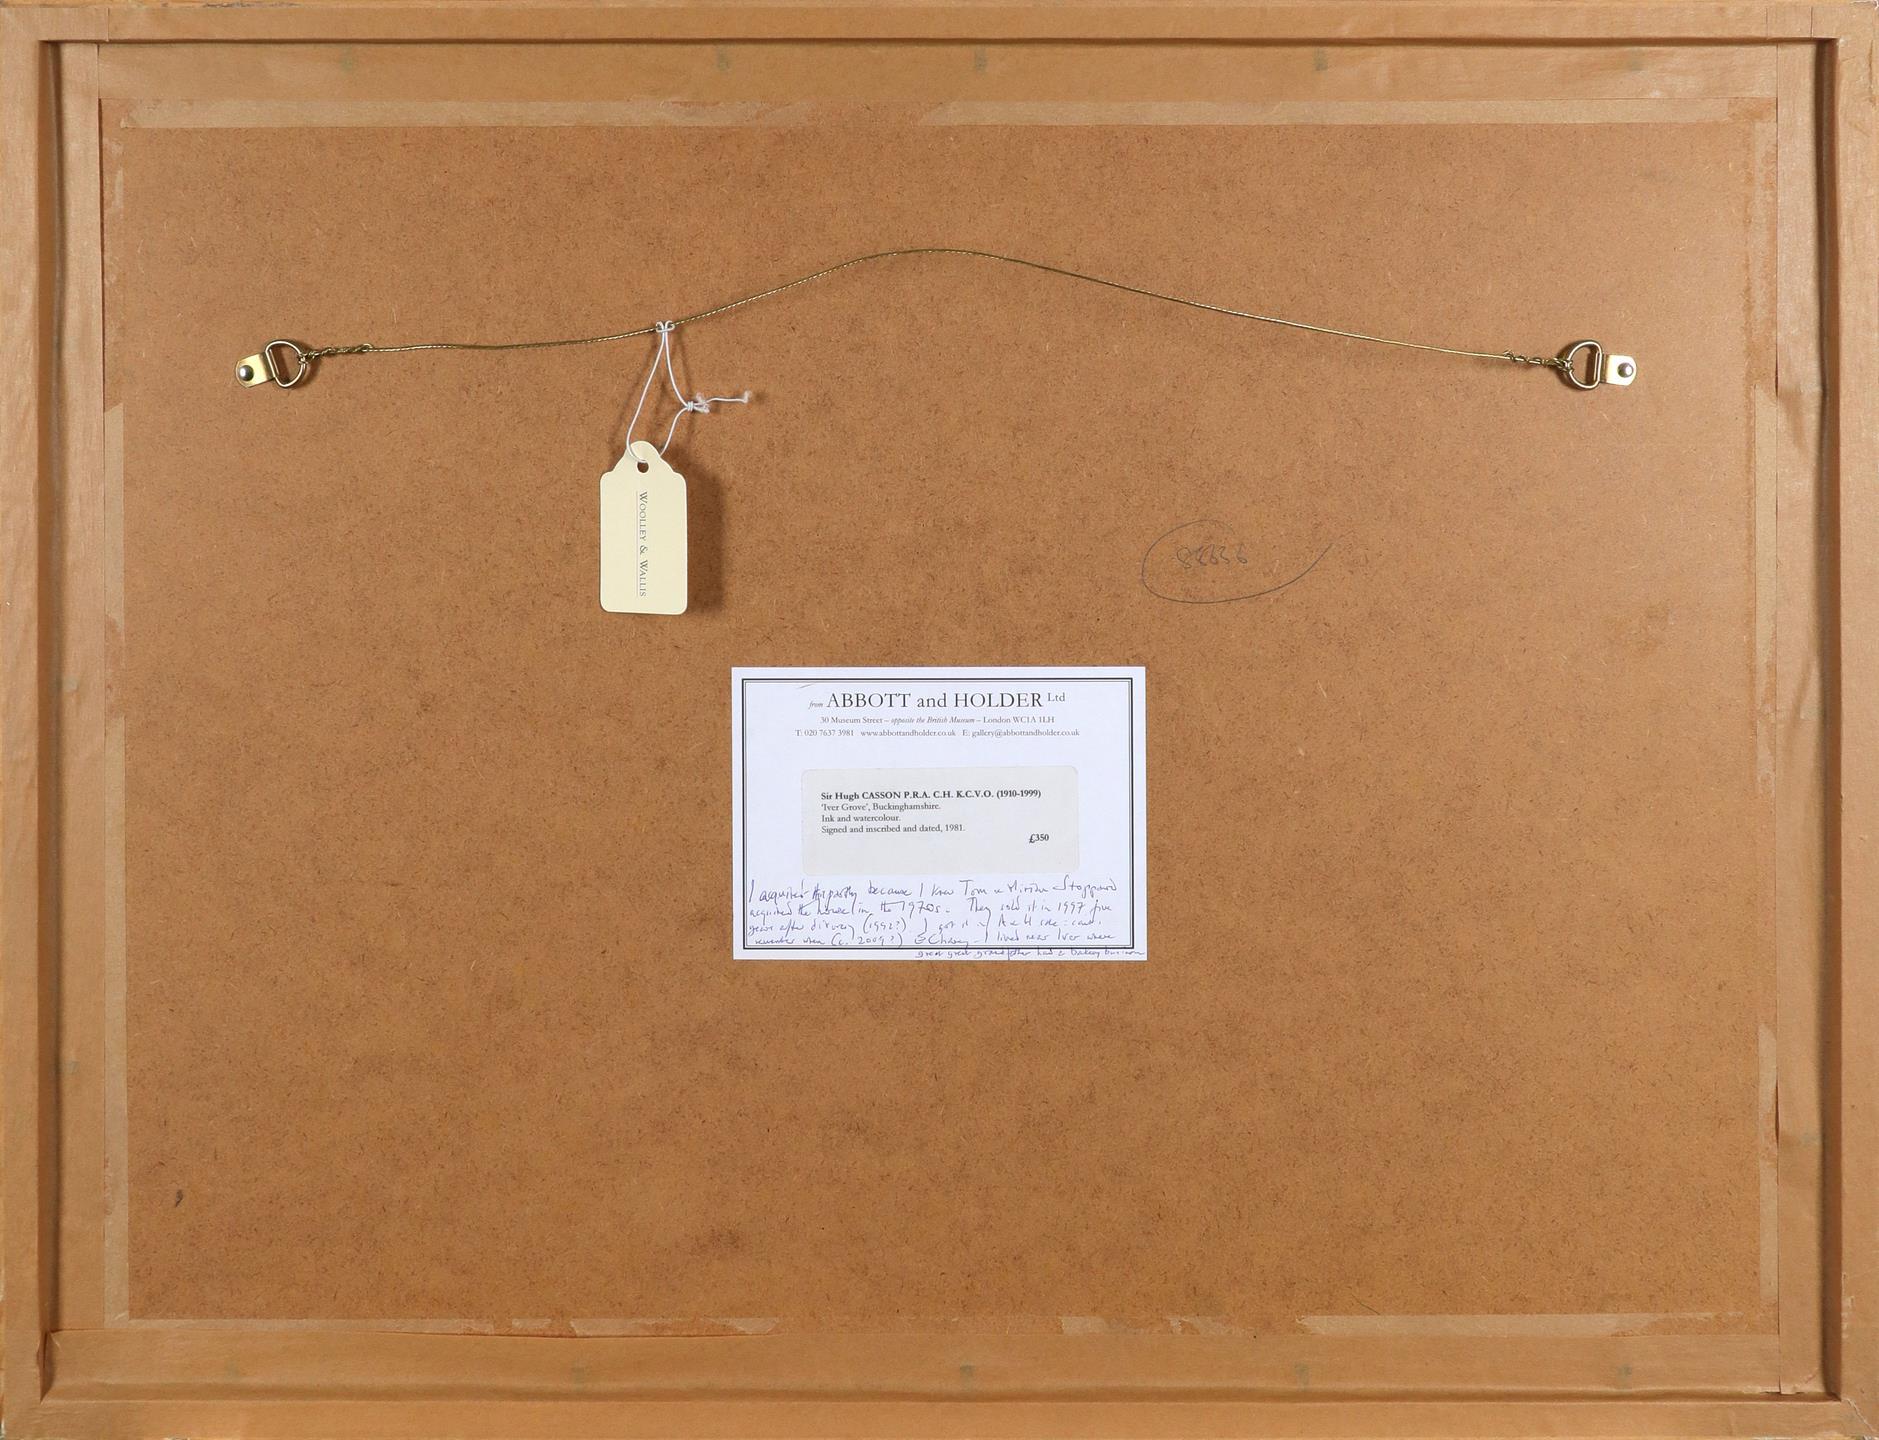 ‡Sir Hugh Casson CH, KKCVO, PRA, RDI (1910-1999) Iver Grove, Buckinghamshire Signed and dated HUGH - Image 3 of 3